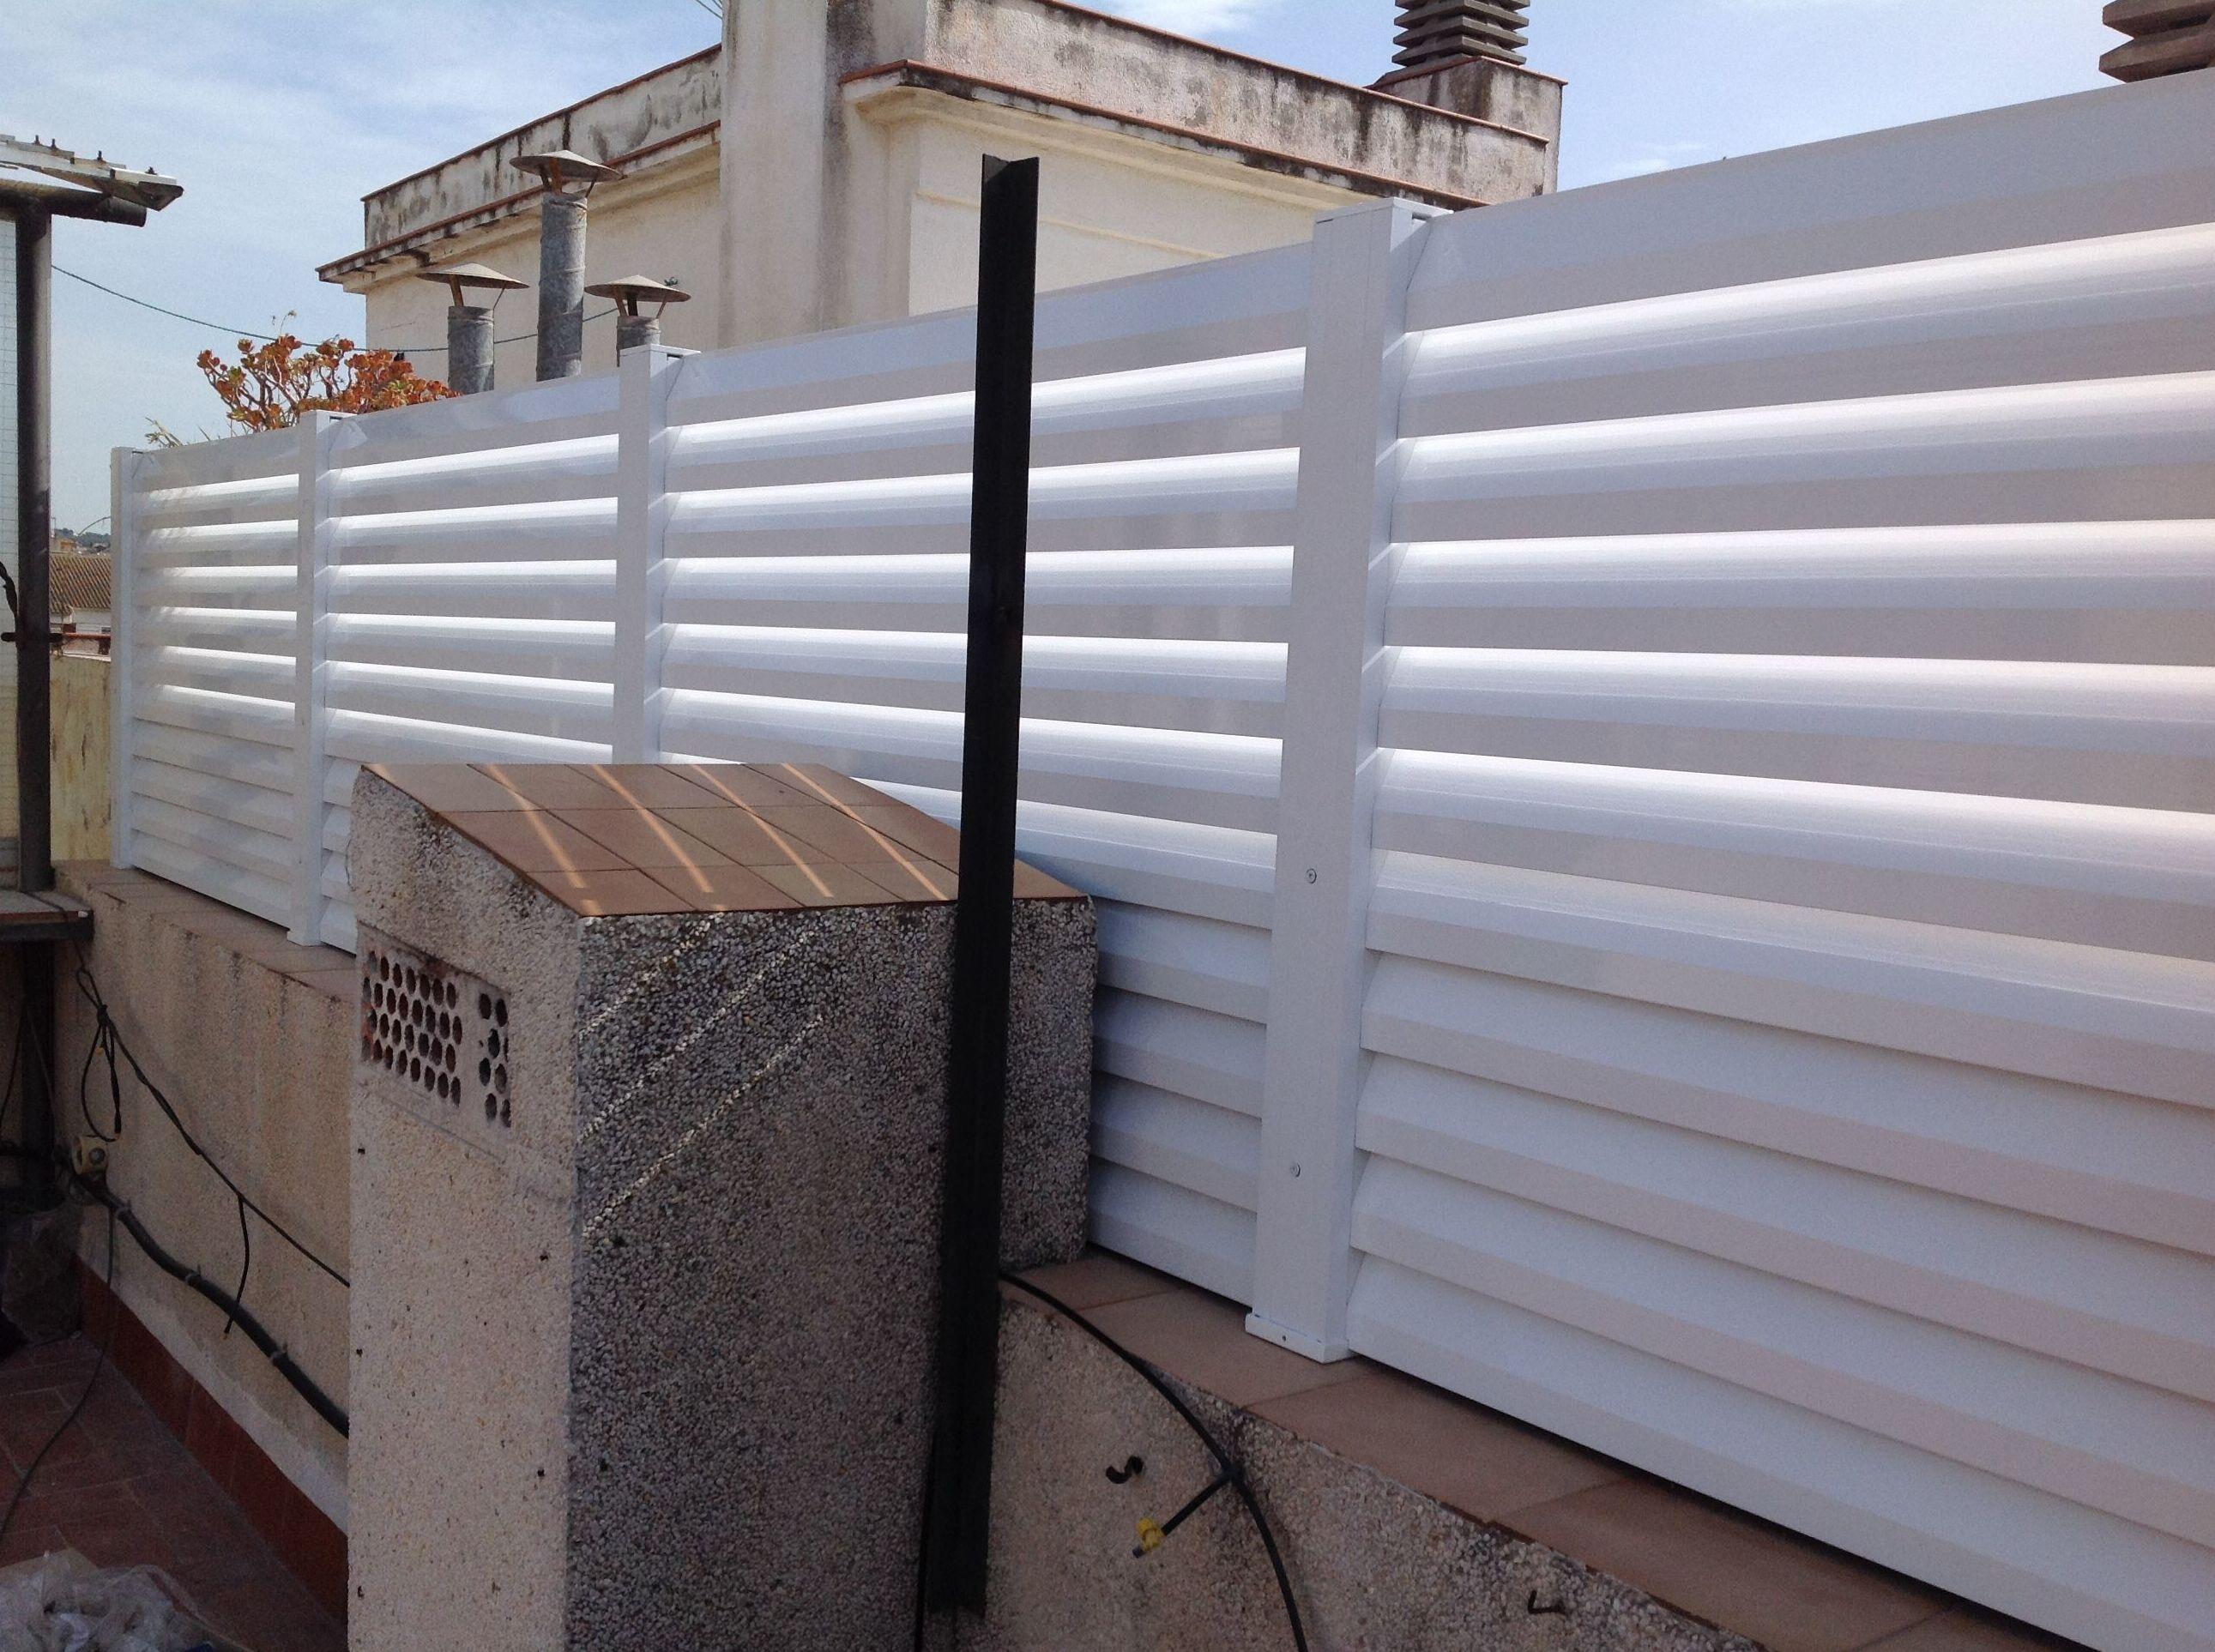 Foto 11 de Carpintería de aluminio, metálica y PVC en Calafell | Aluminis Solé